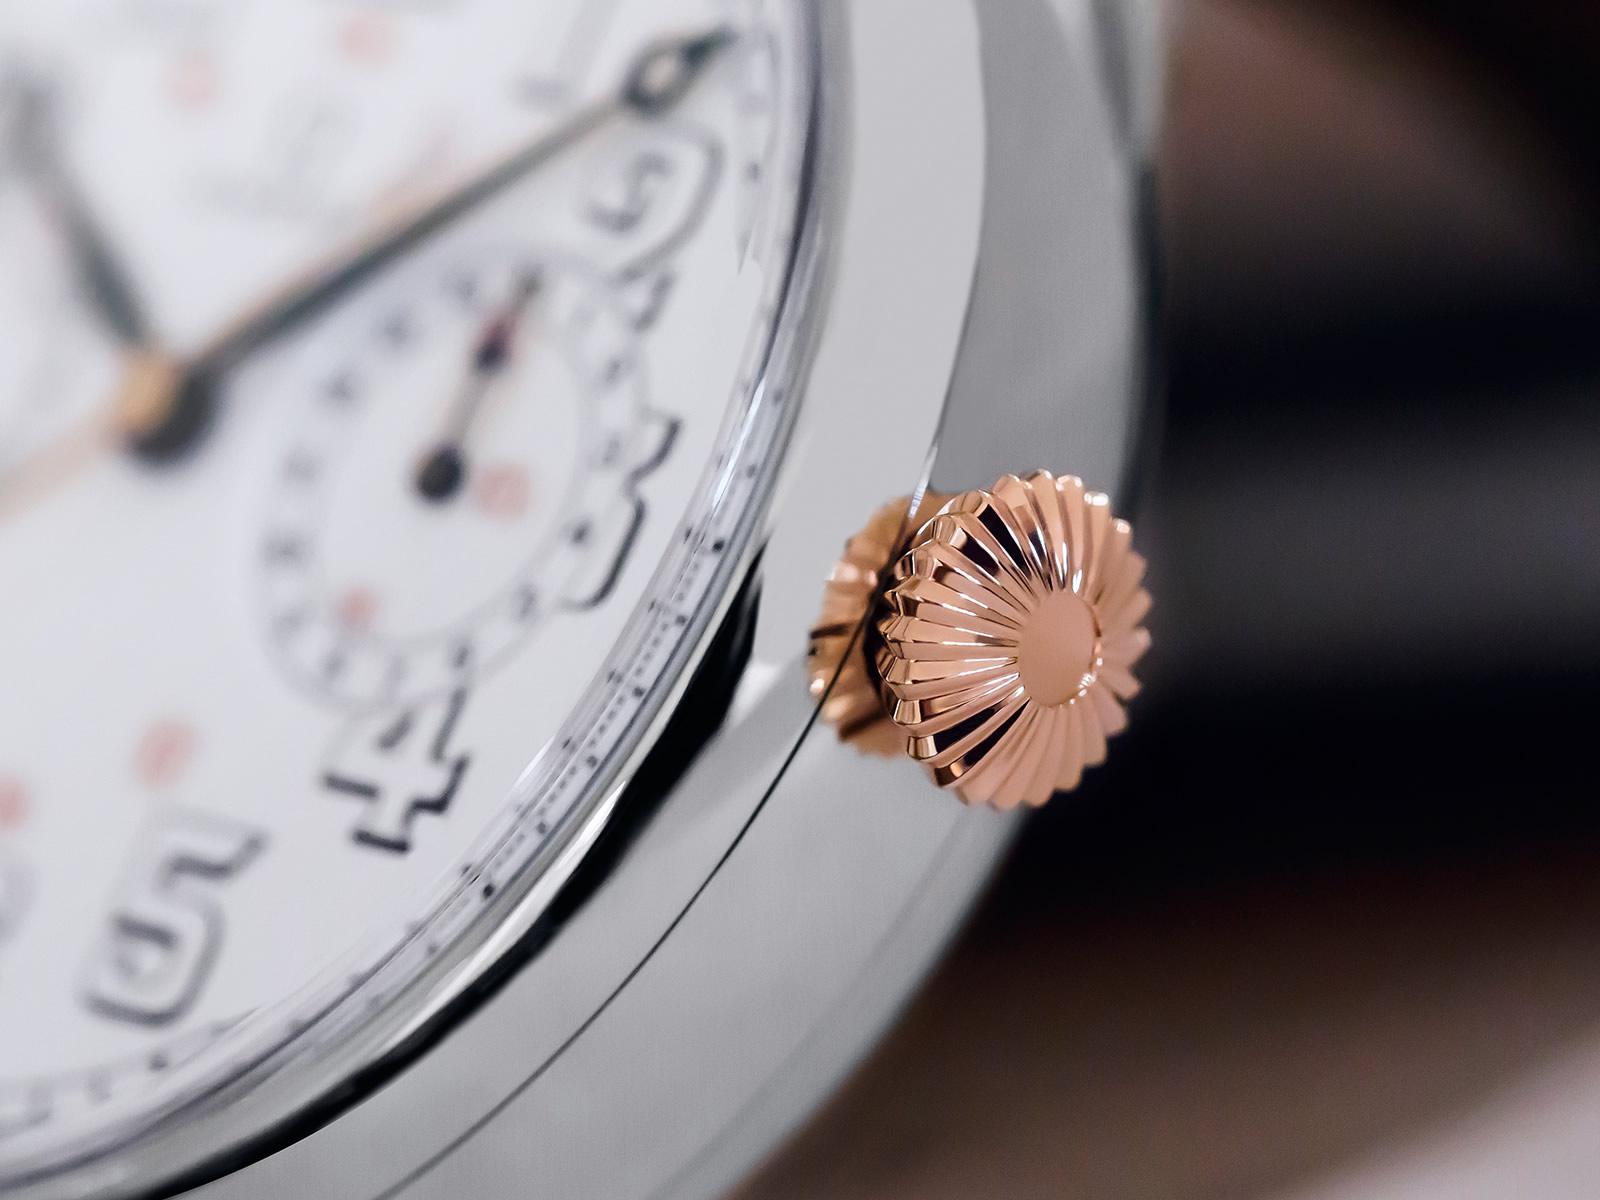 De fraaie gevormde kroon van de Omega First Wrist-Chronograph Limited Edition